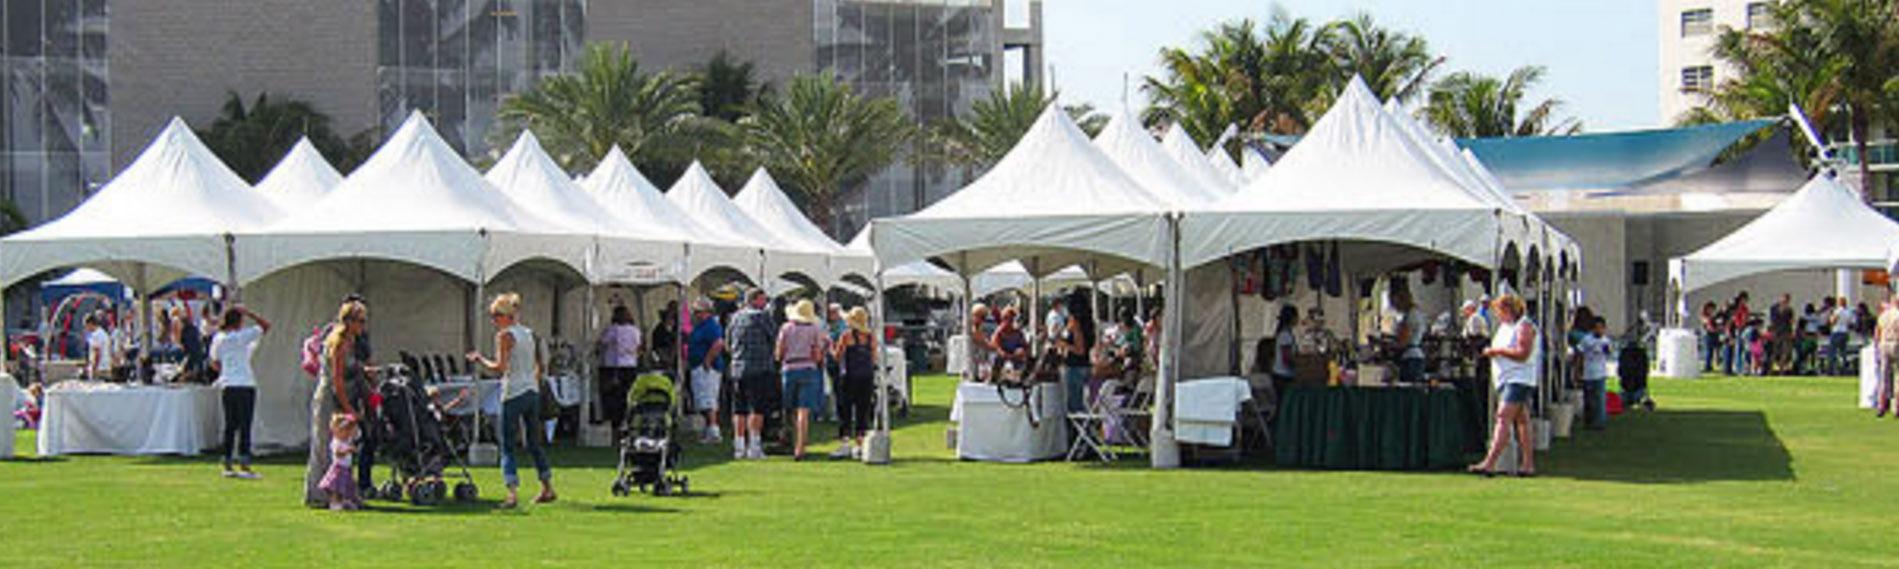 Primera Feria de Arte en Sunny Isles Beach